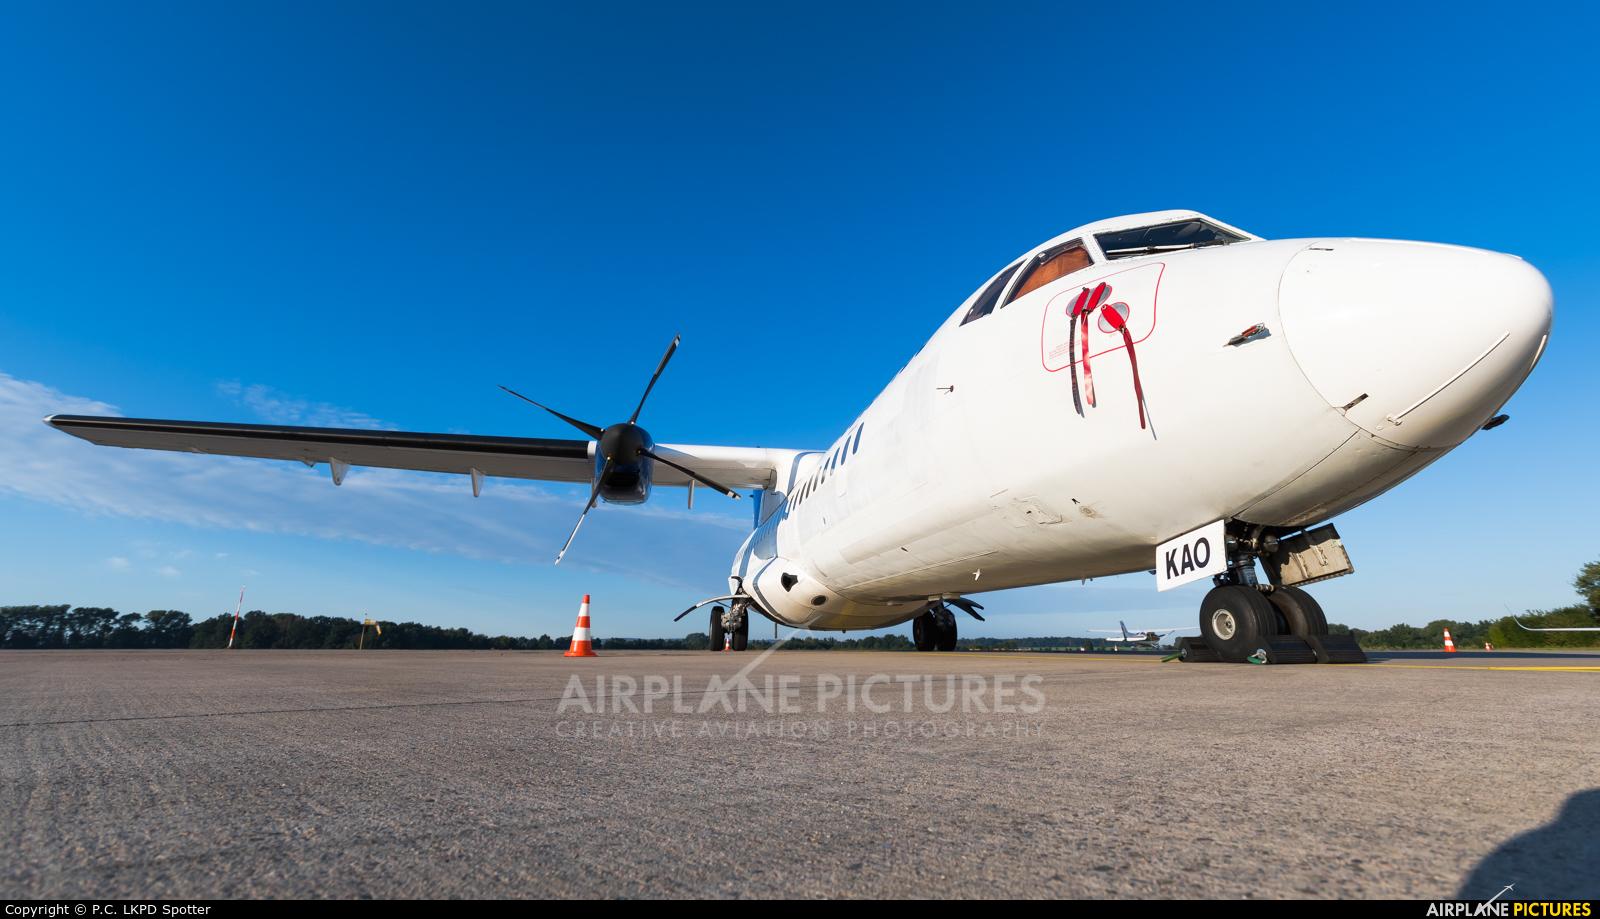 Fleet Air International HA-KAO aircraft at Pardubice